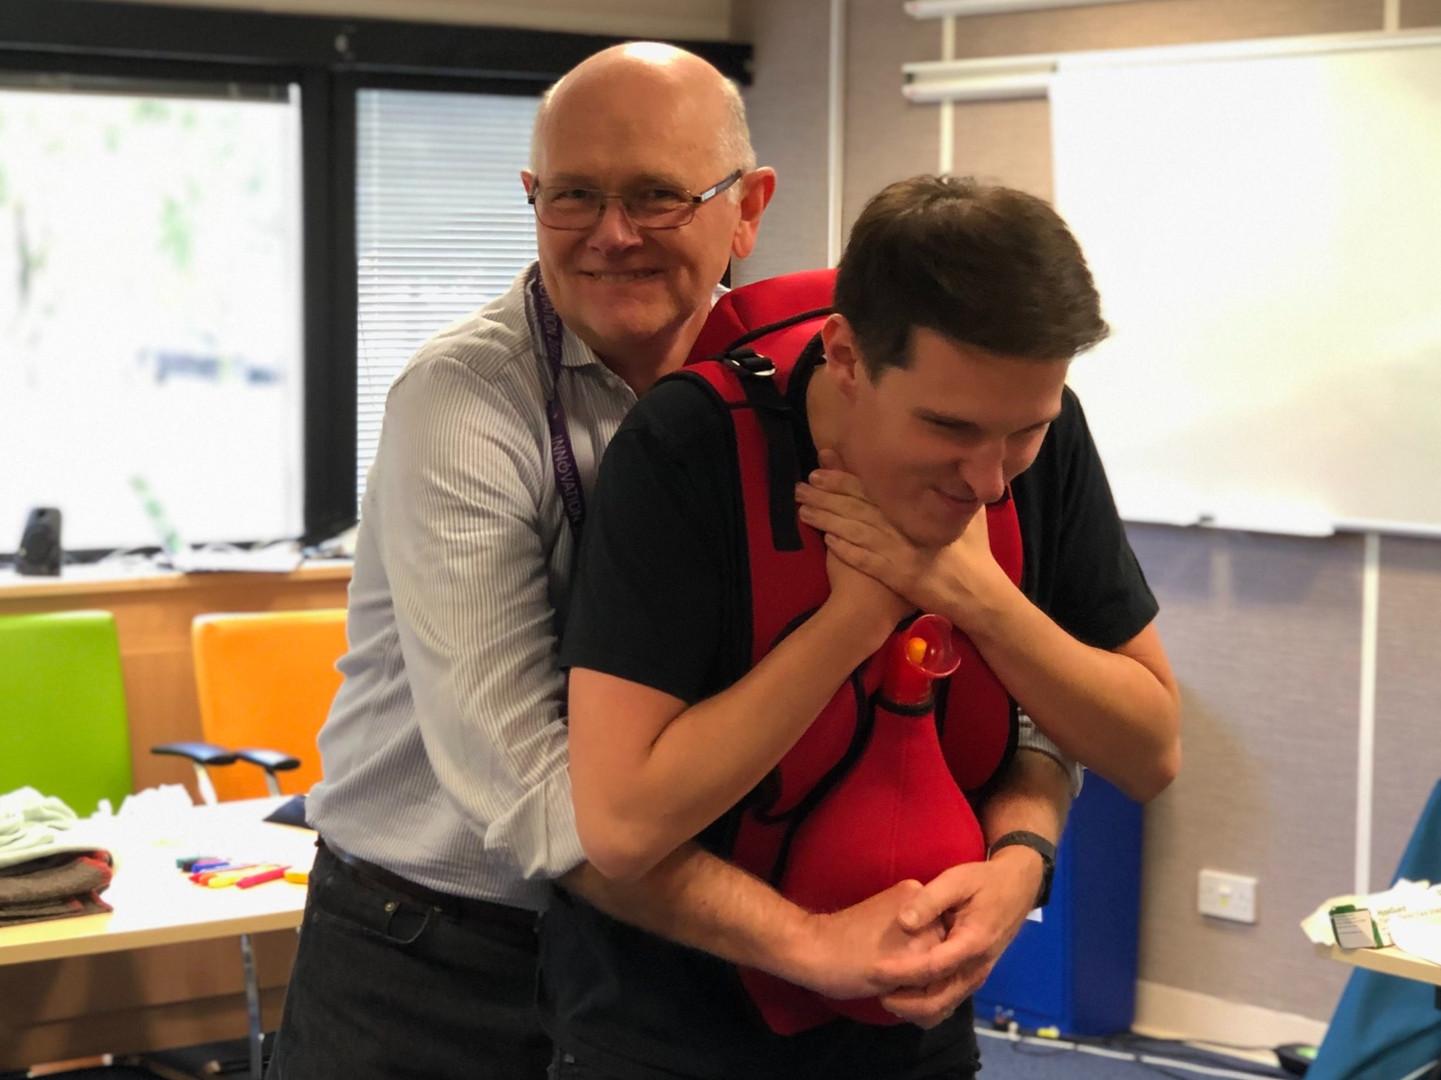 Choking training